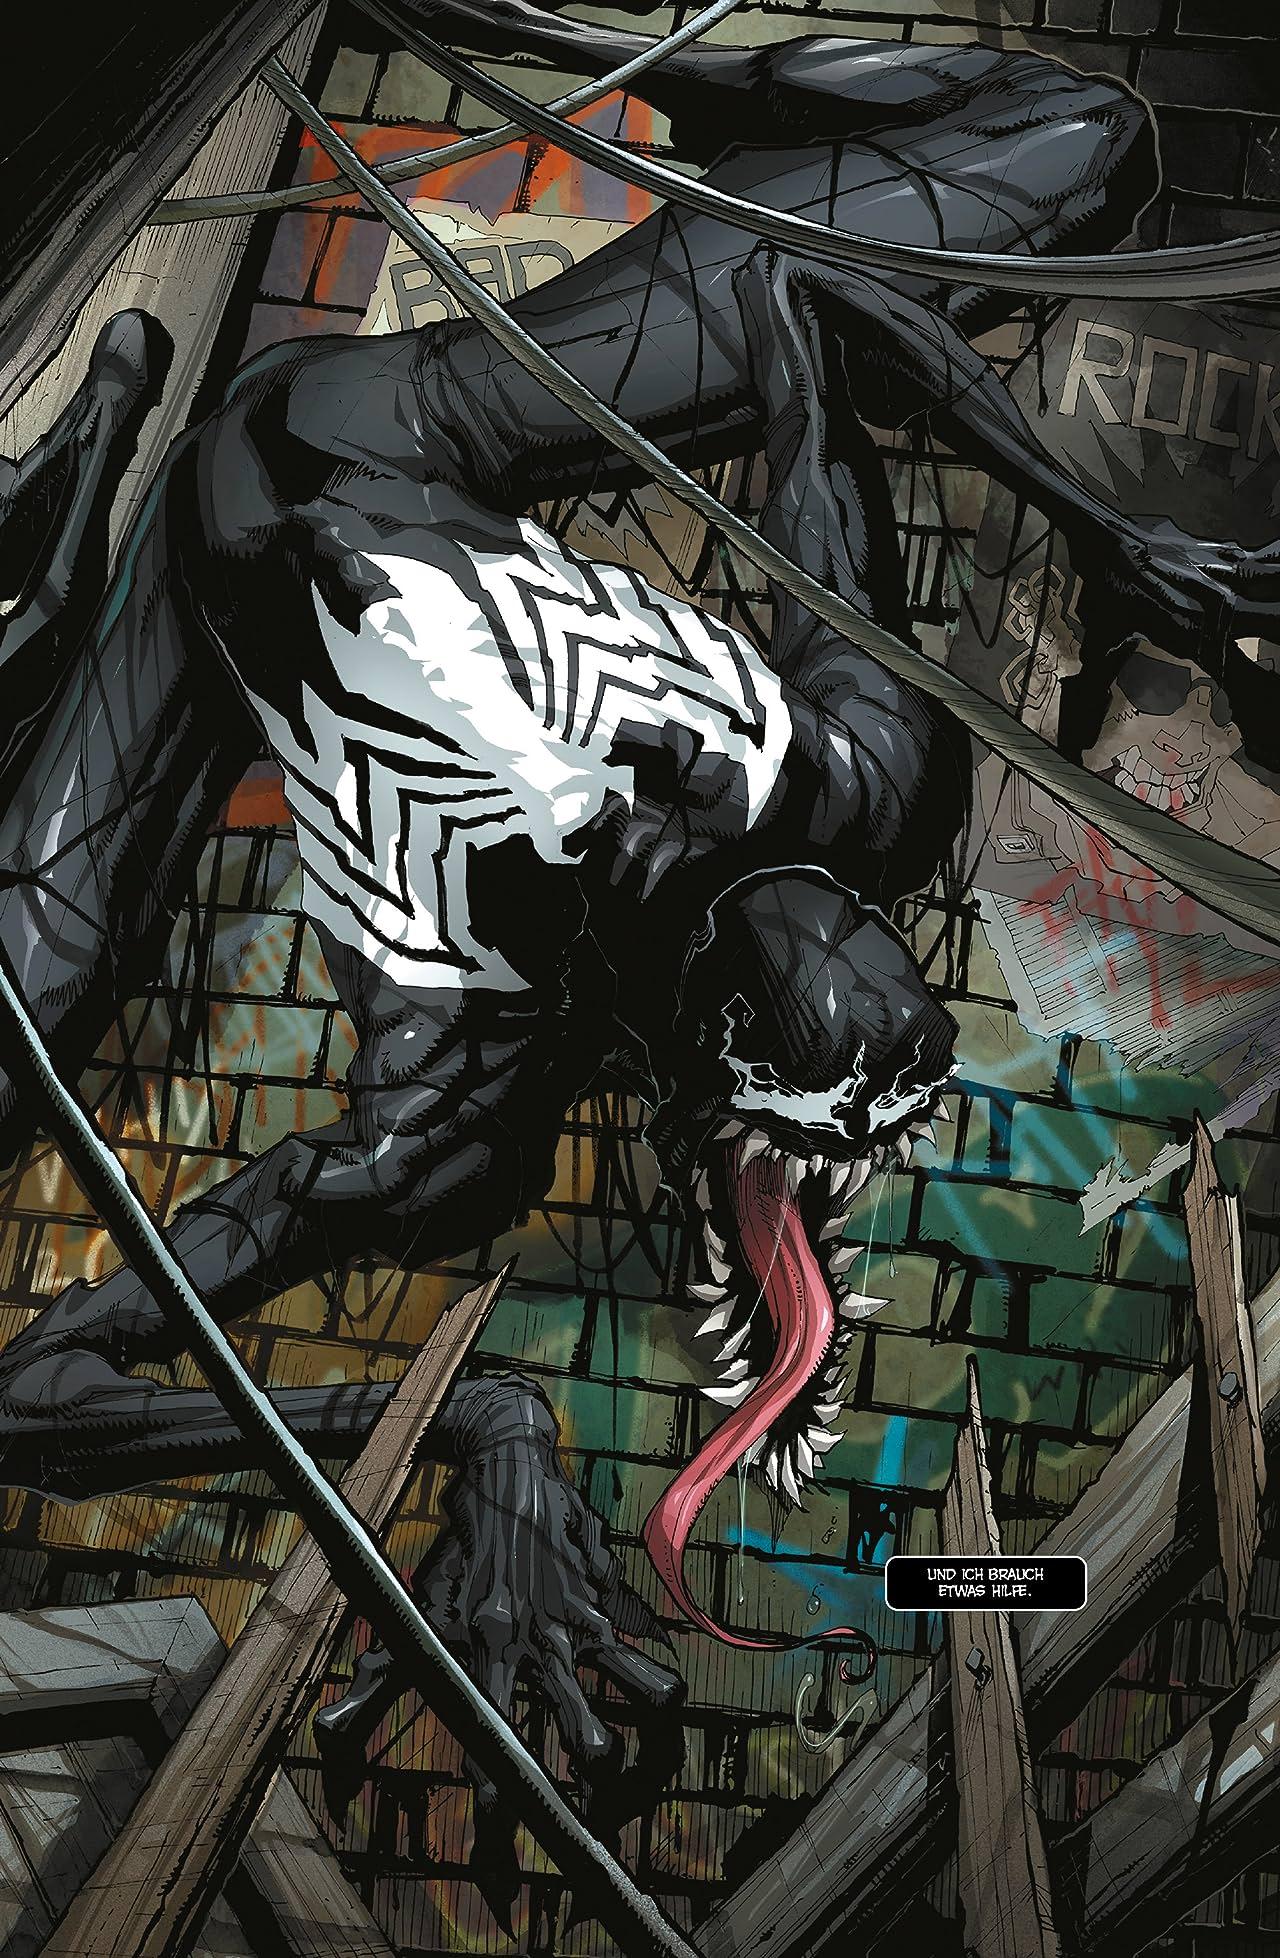 Venom Vol. 1: Finstere Rückkehr